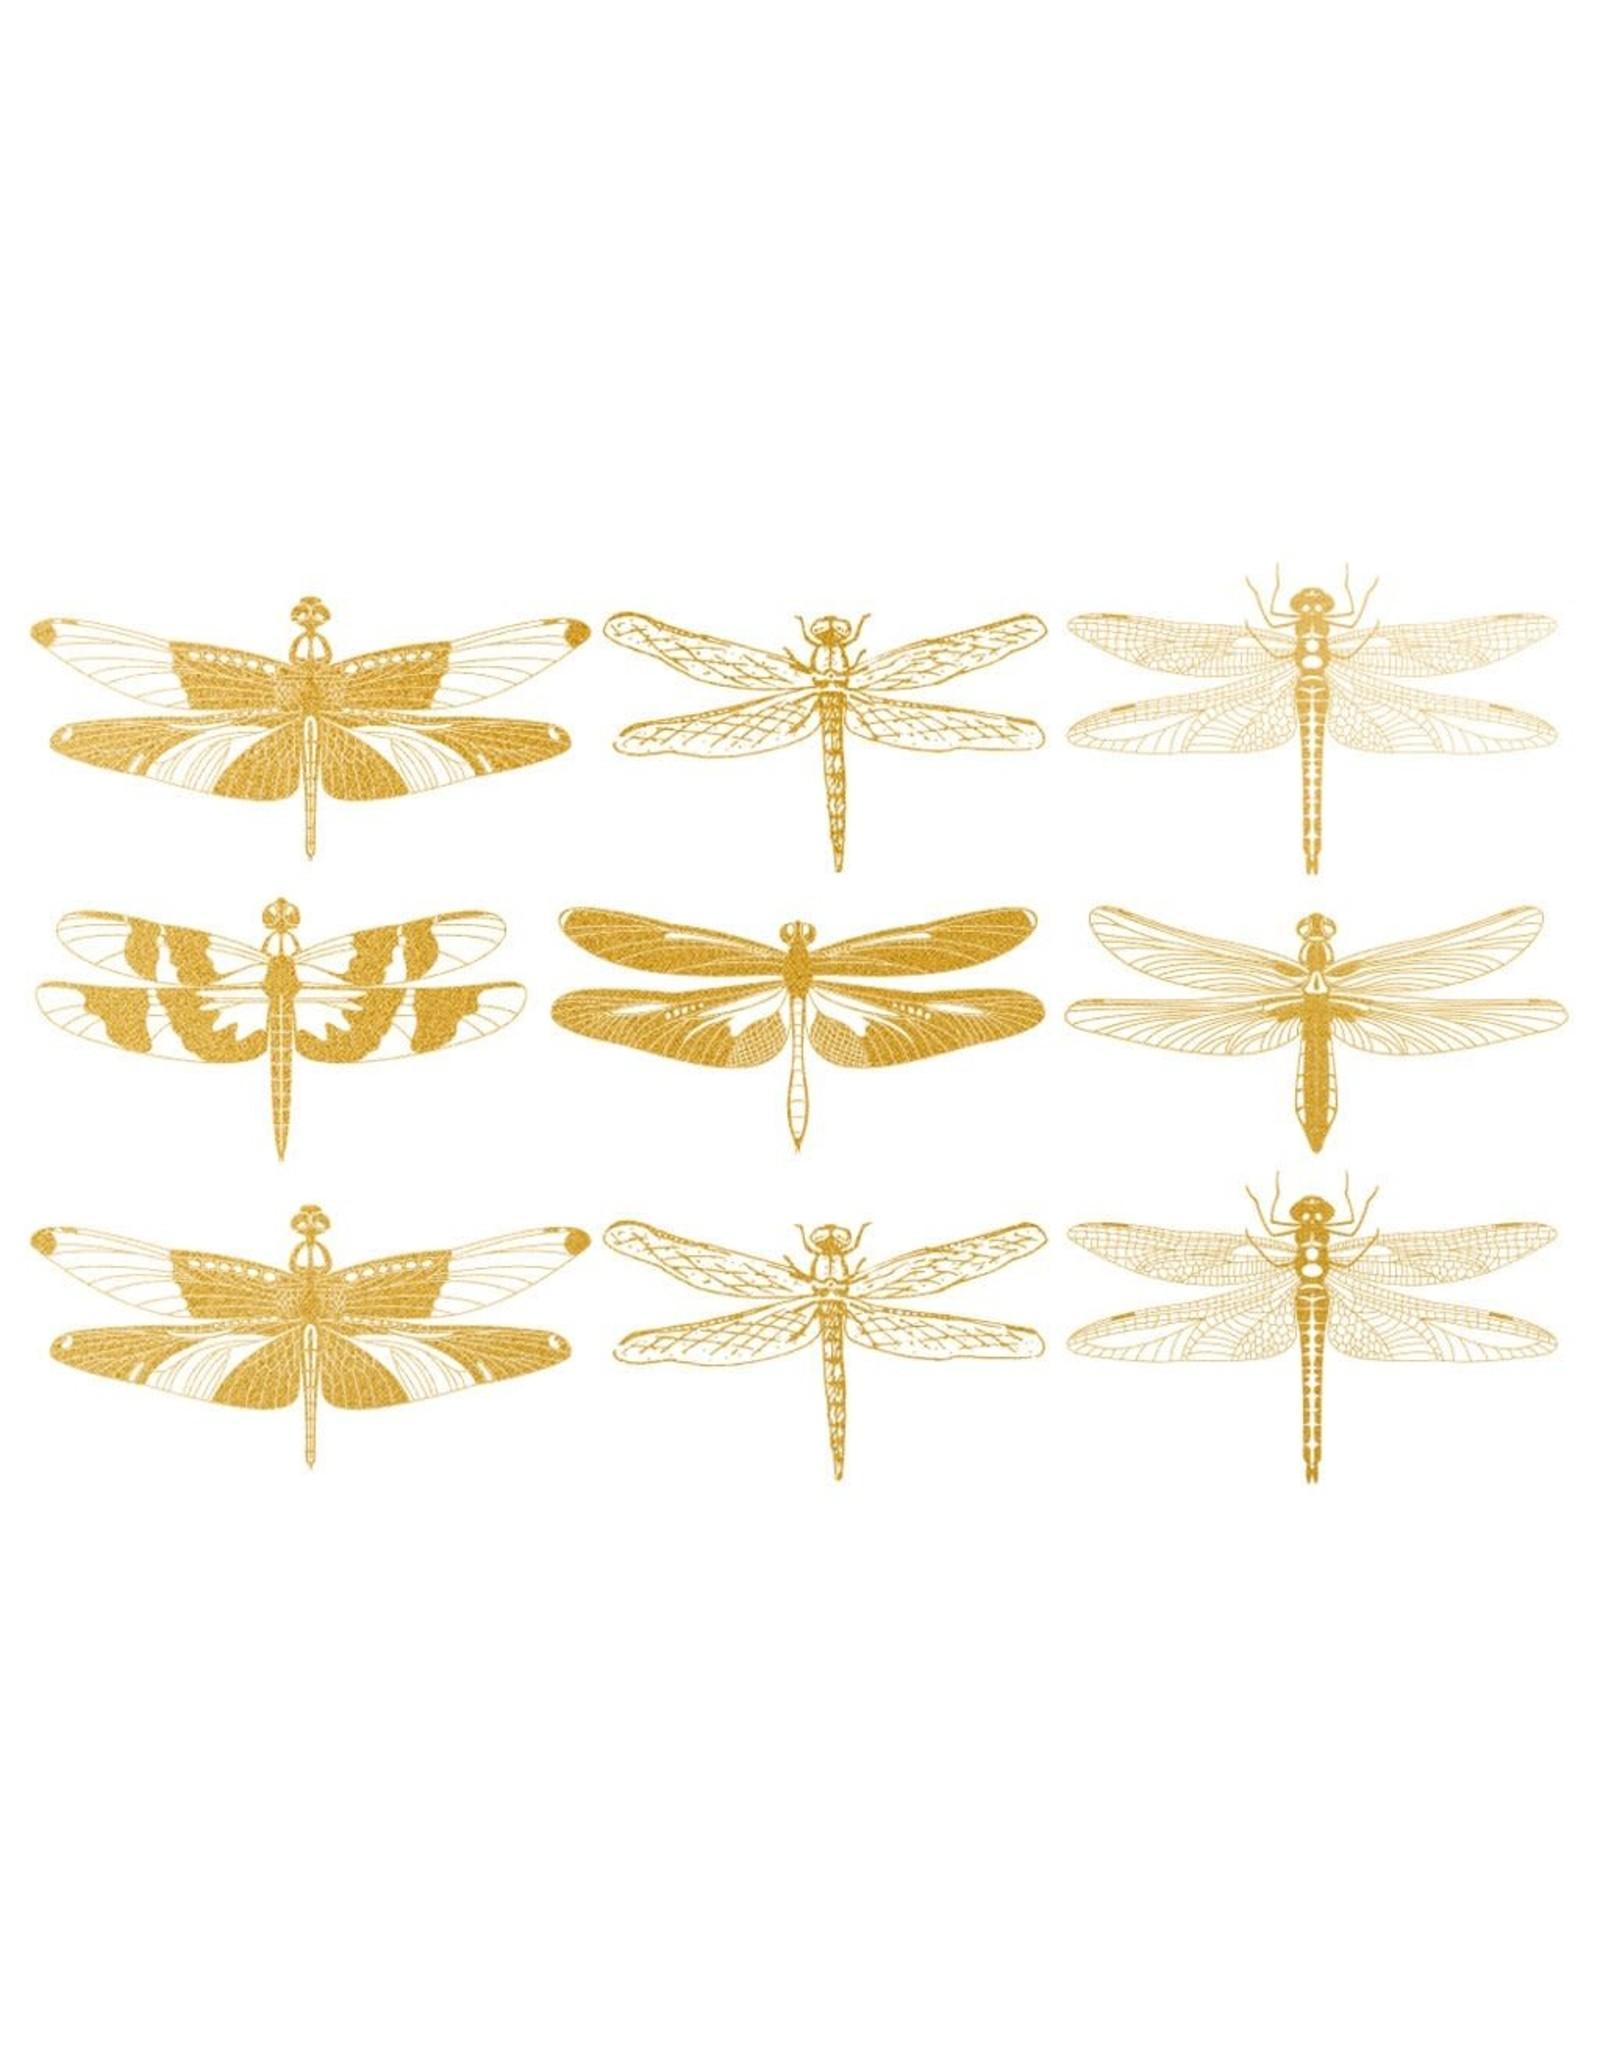 Sanbao Gold Dragonfly